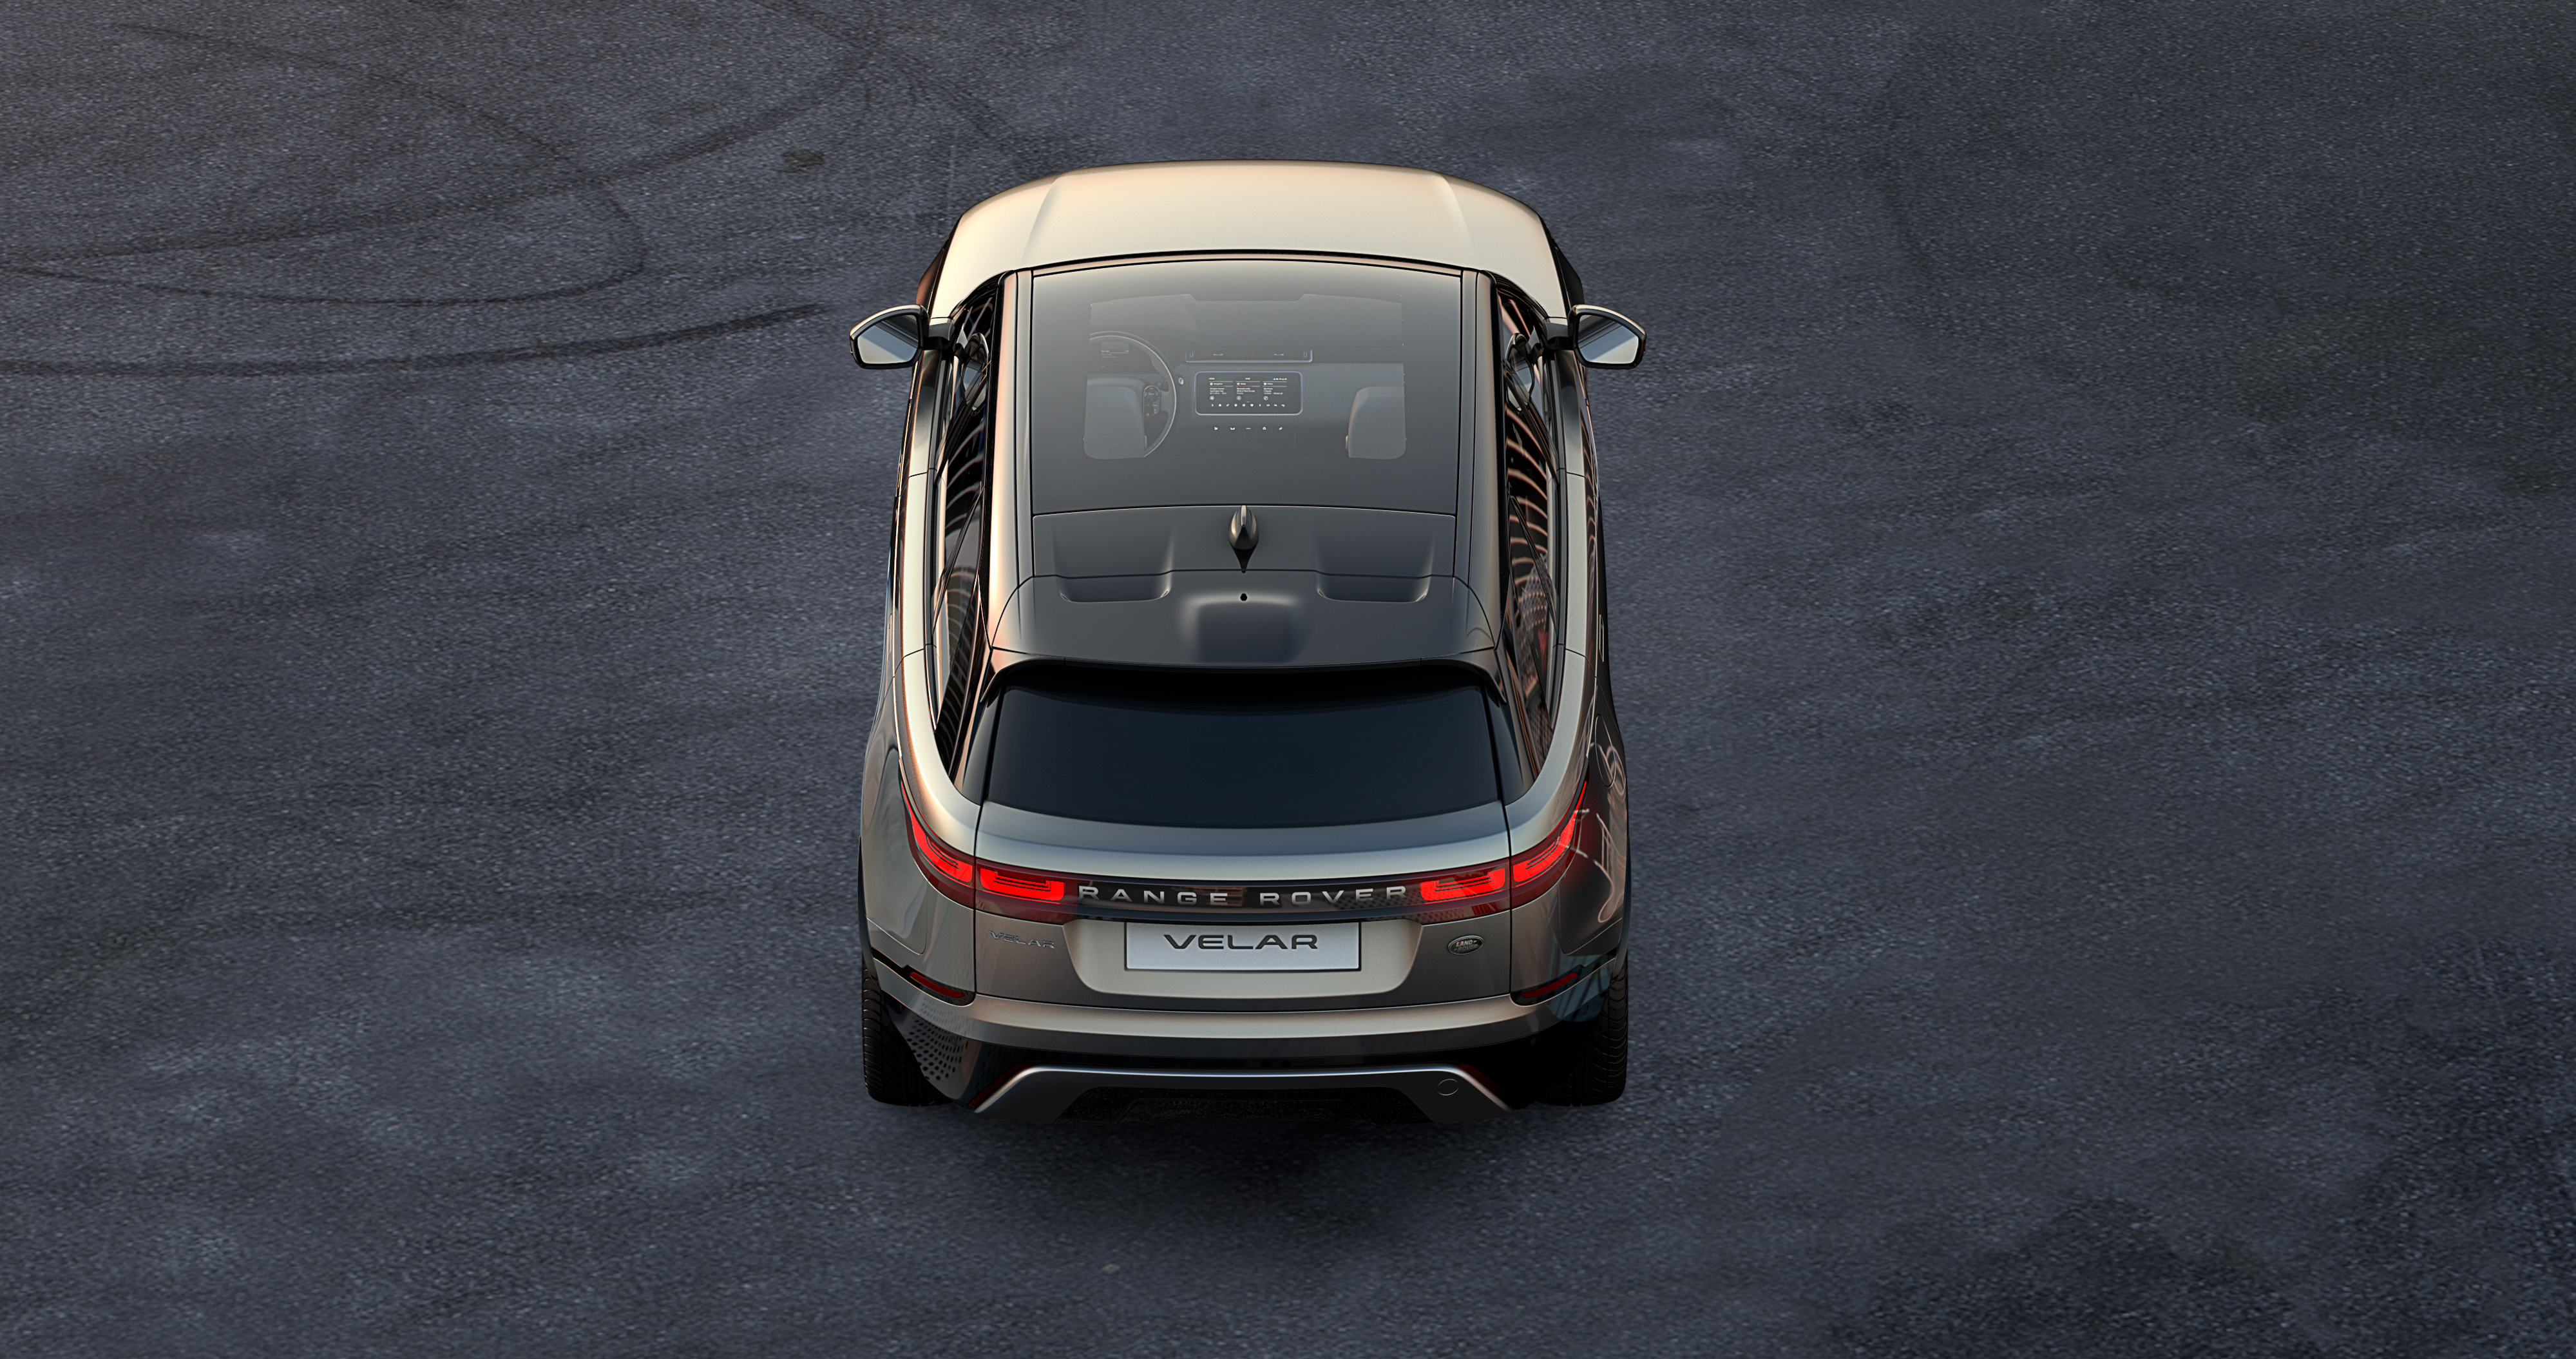 Introducing Range Rover Velar